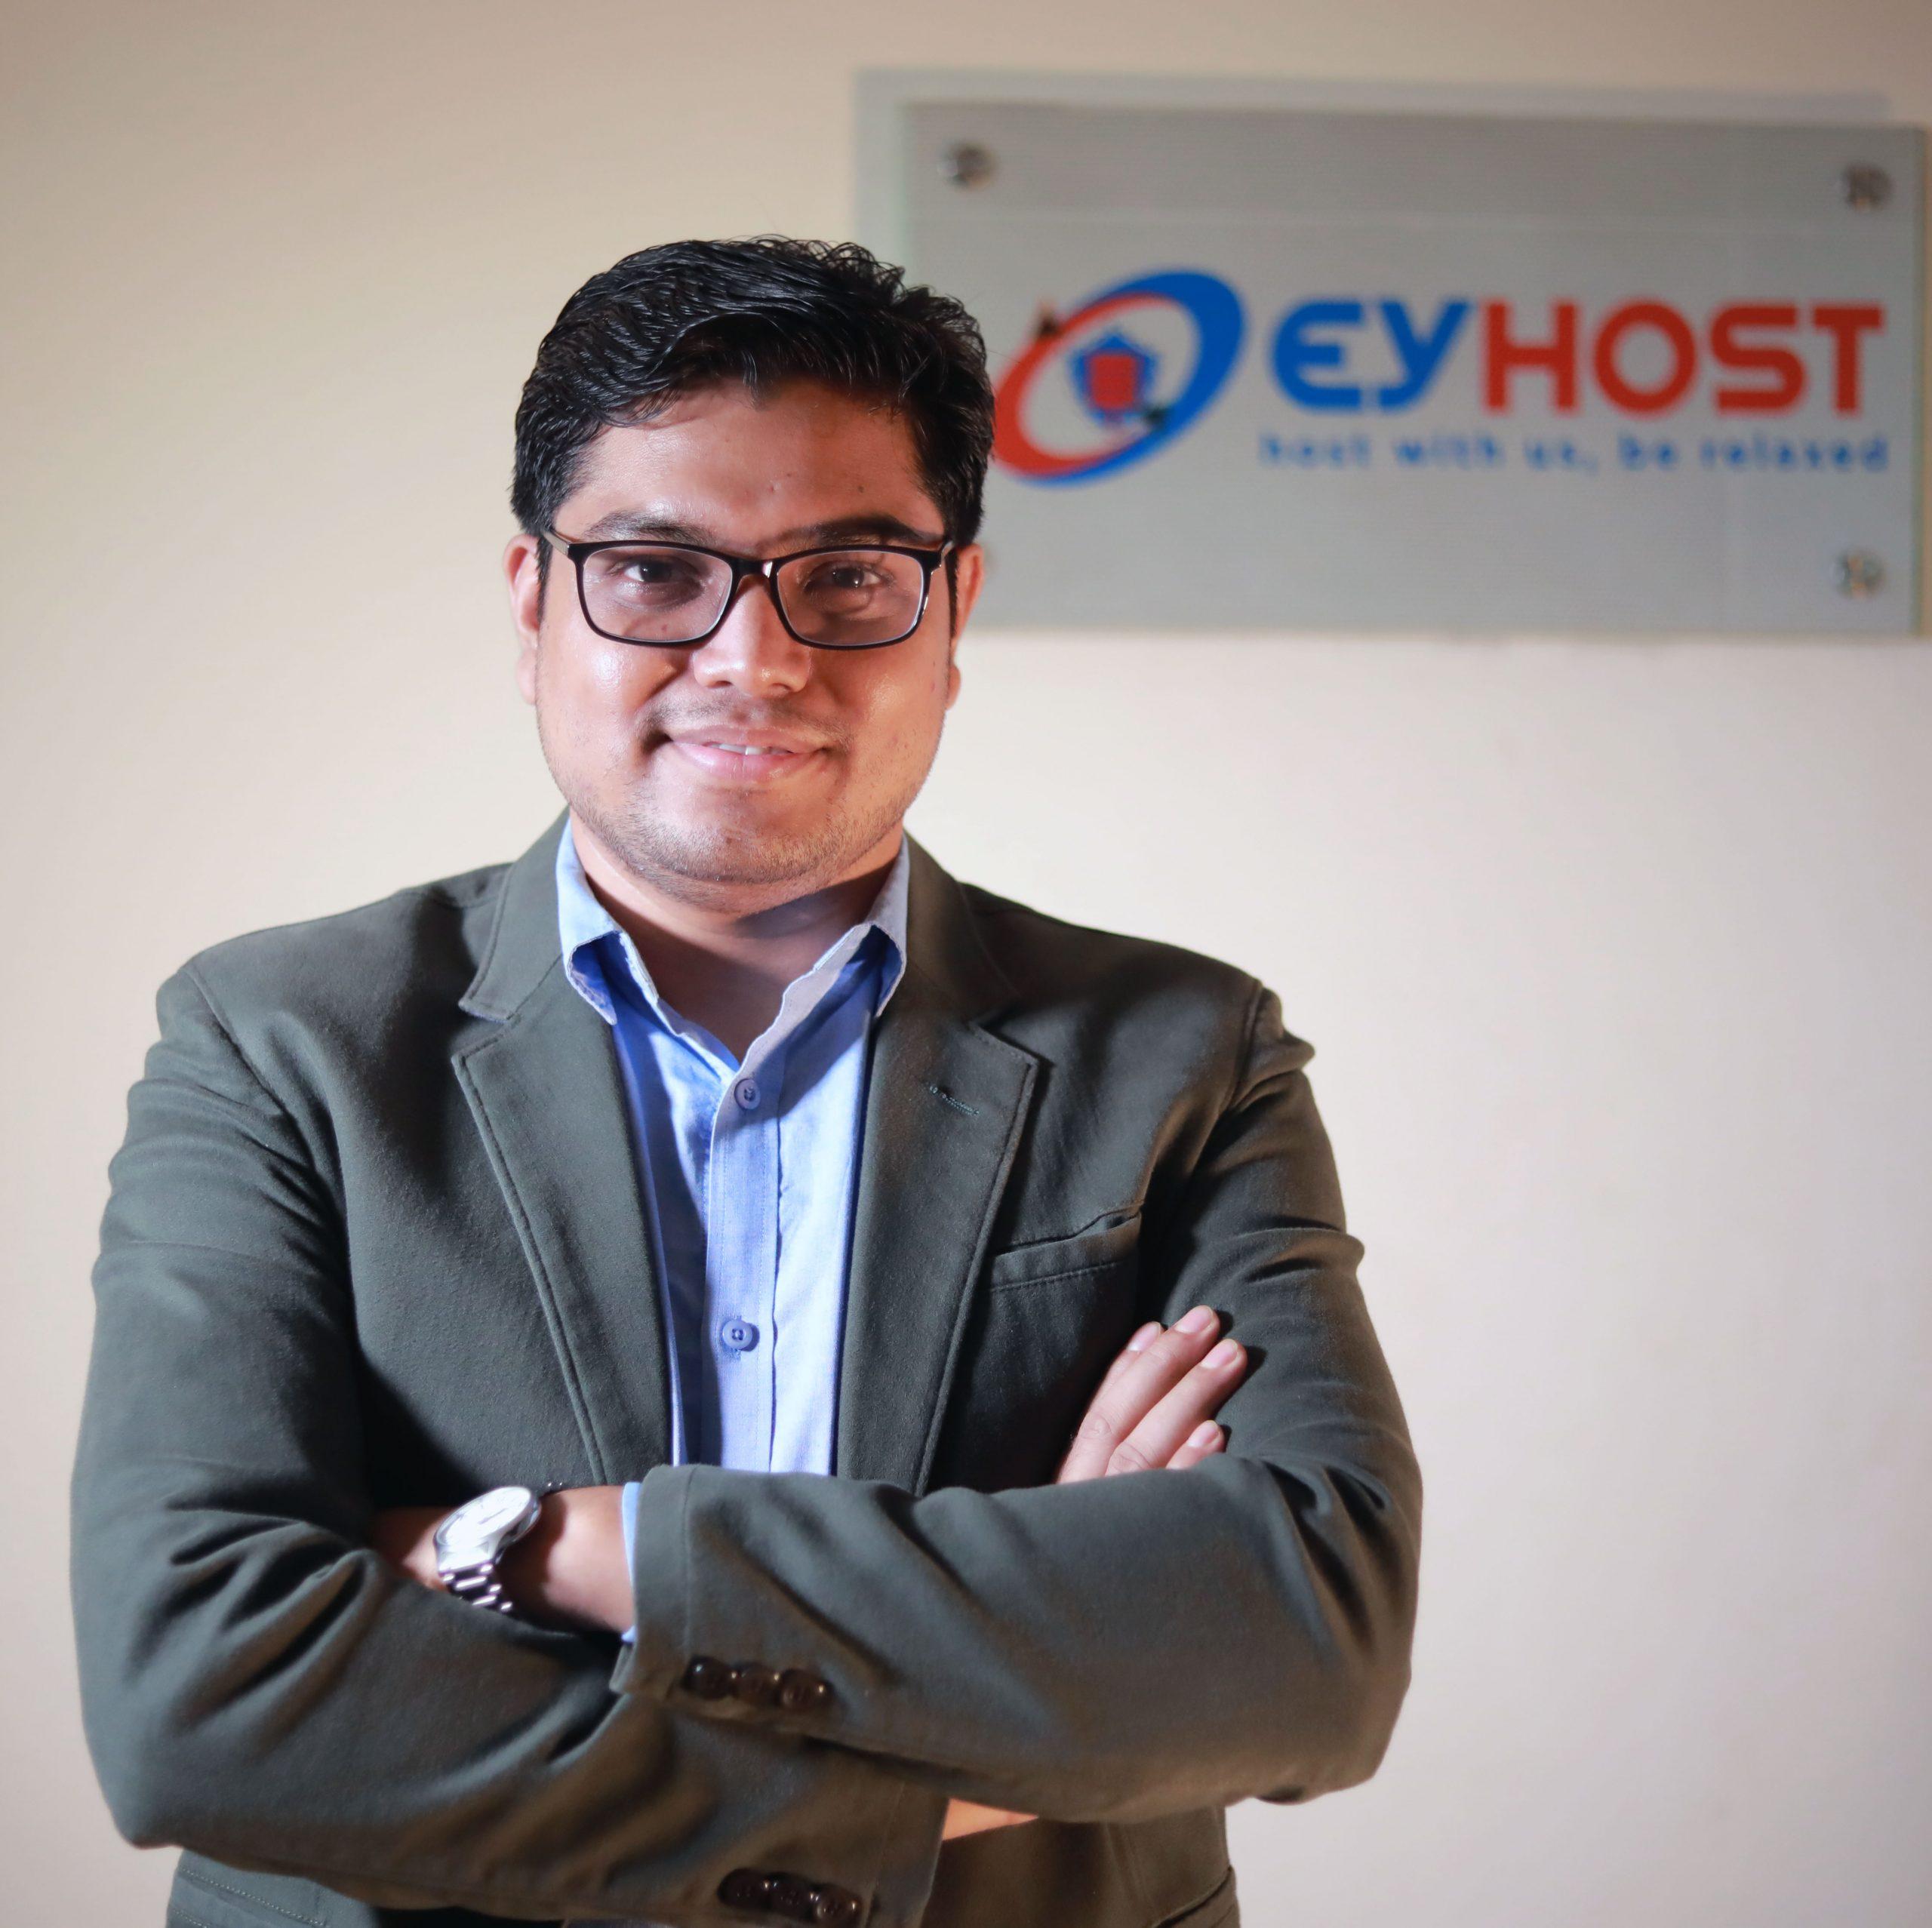 Imran Hossen